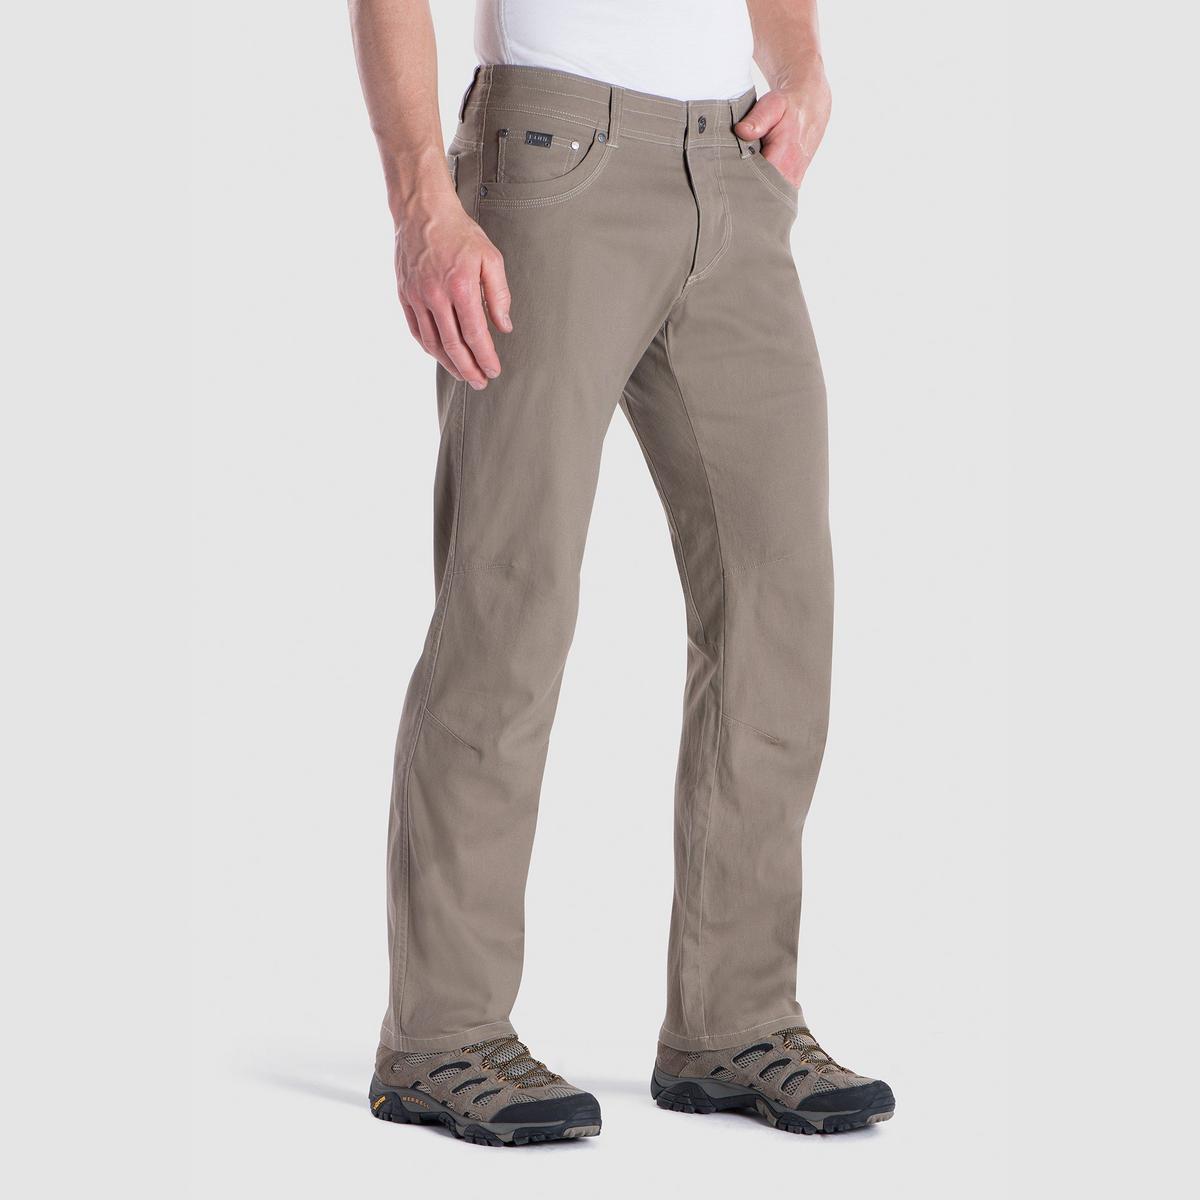 Kuhl Men's Kanvus Jean, Short- Khaki